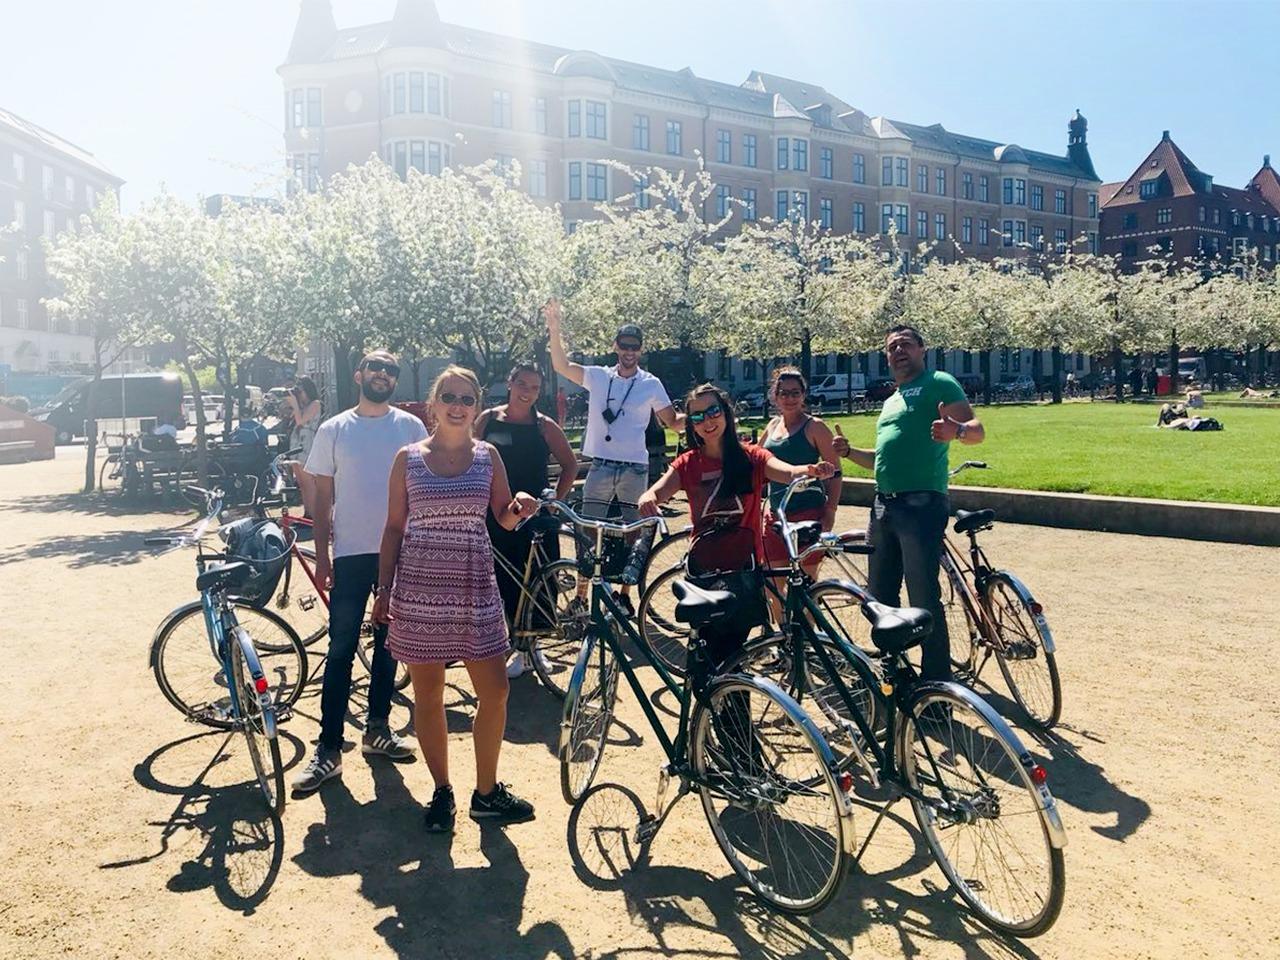 ride the bike in kopenhagen